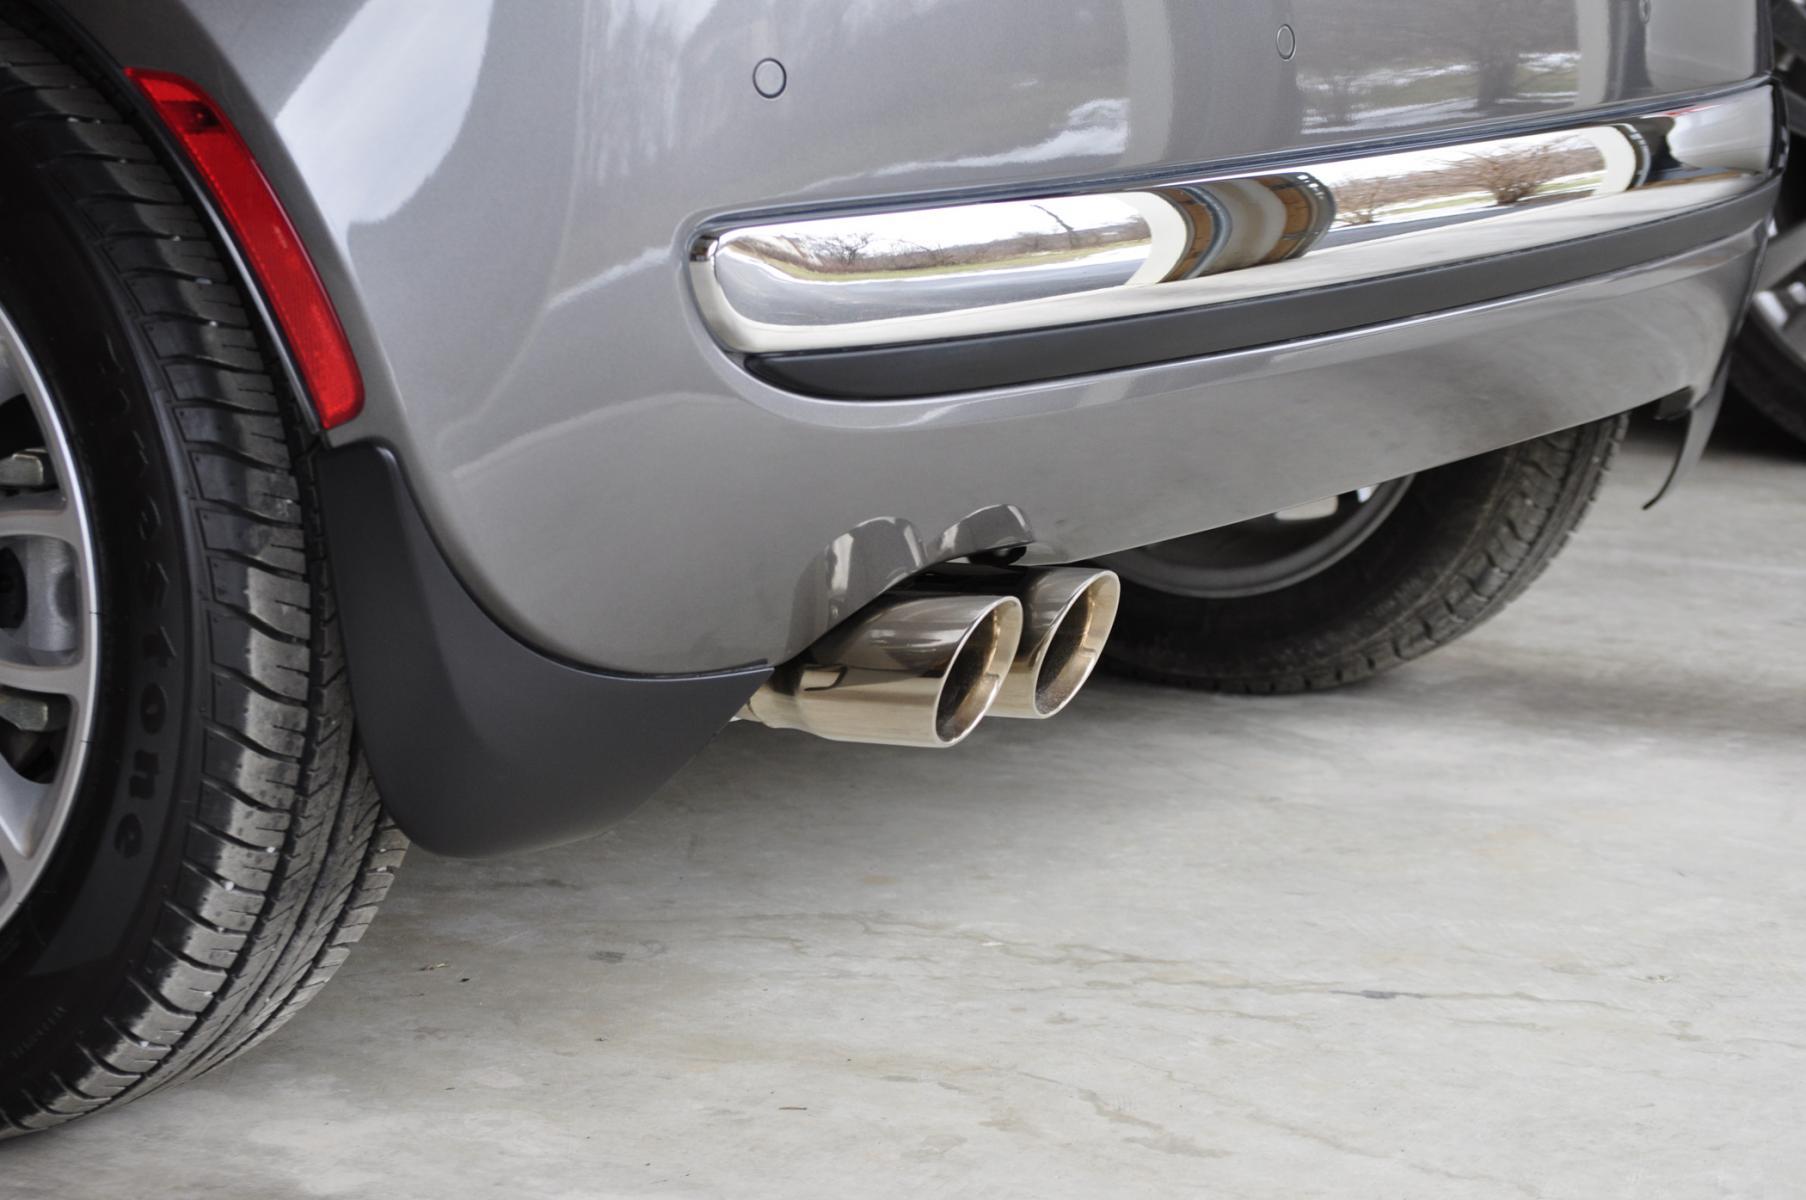 rrm 500 axle back exhaust fiat 500 forum